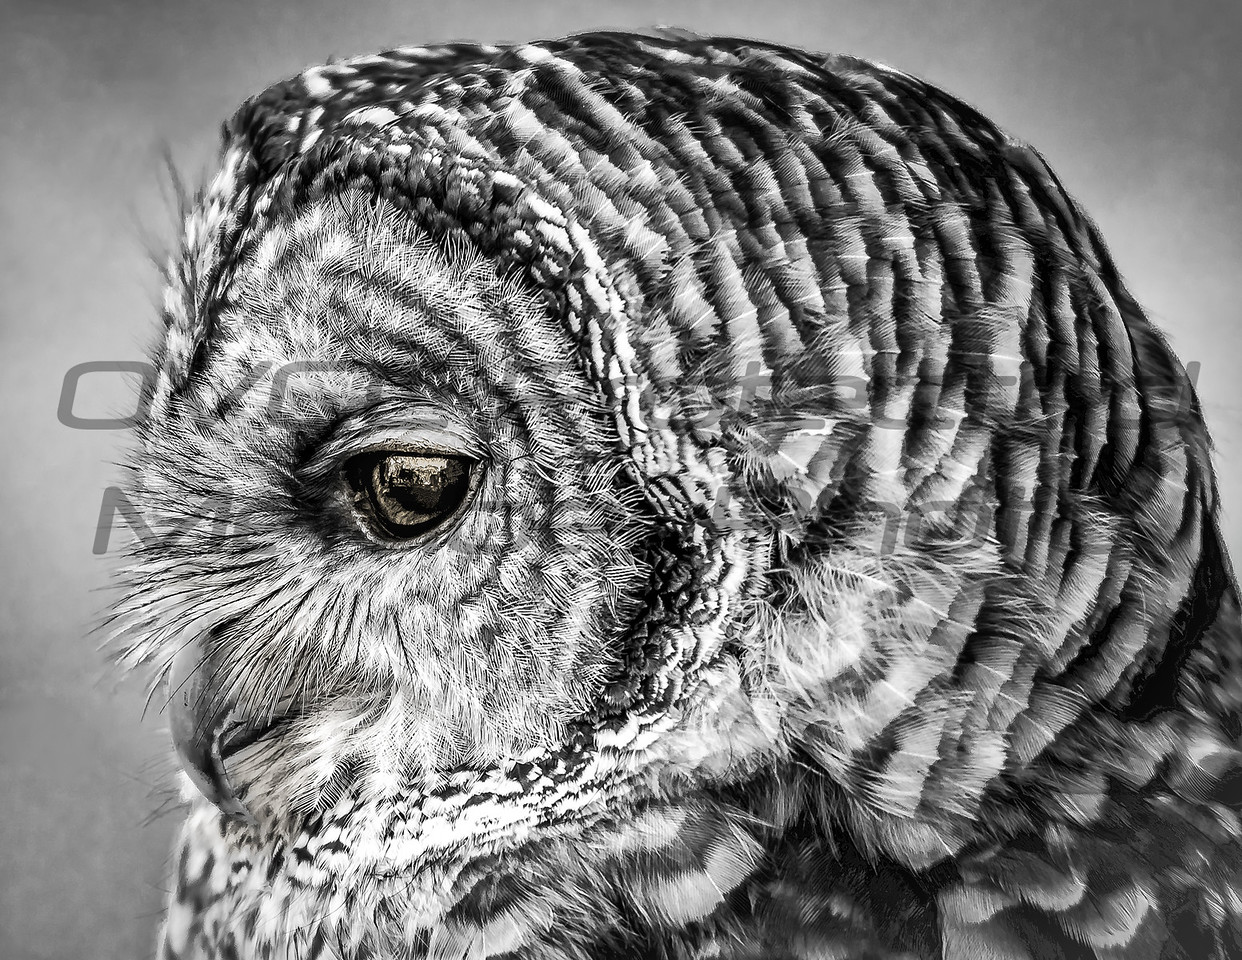 Barred Owl Side B&W by Jonathan Neeld -  jn4photo@gmail.com